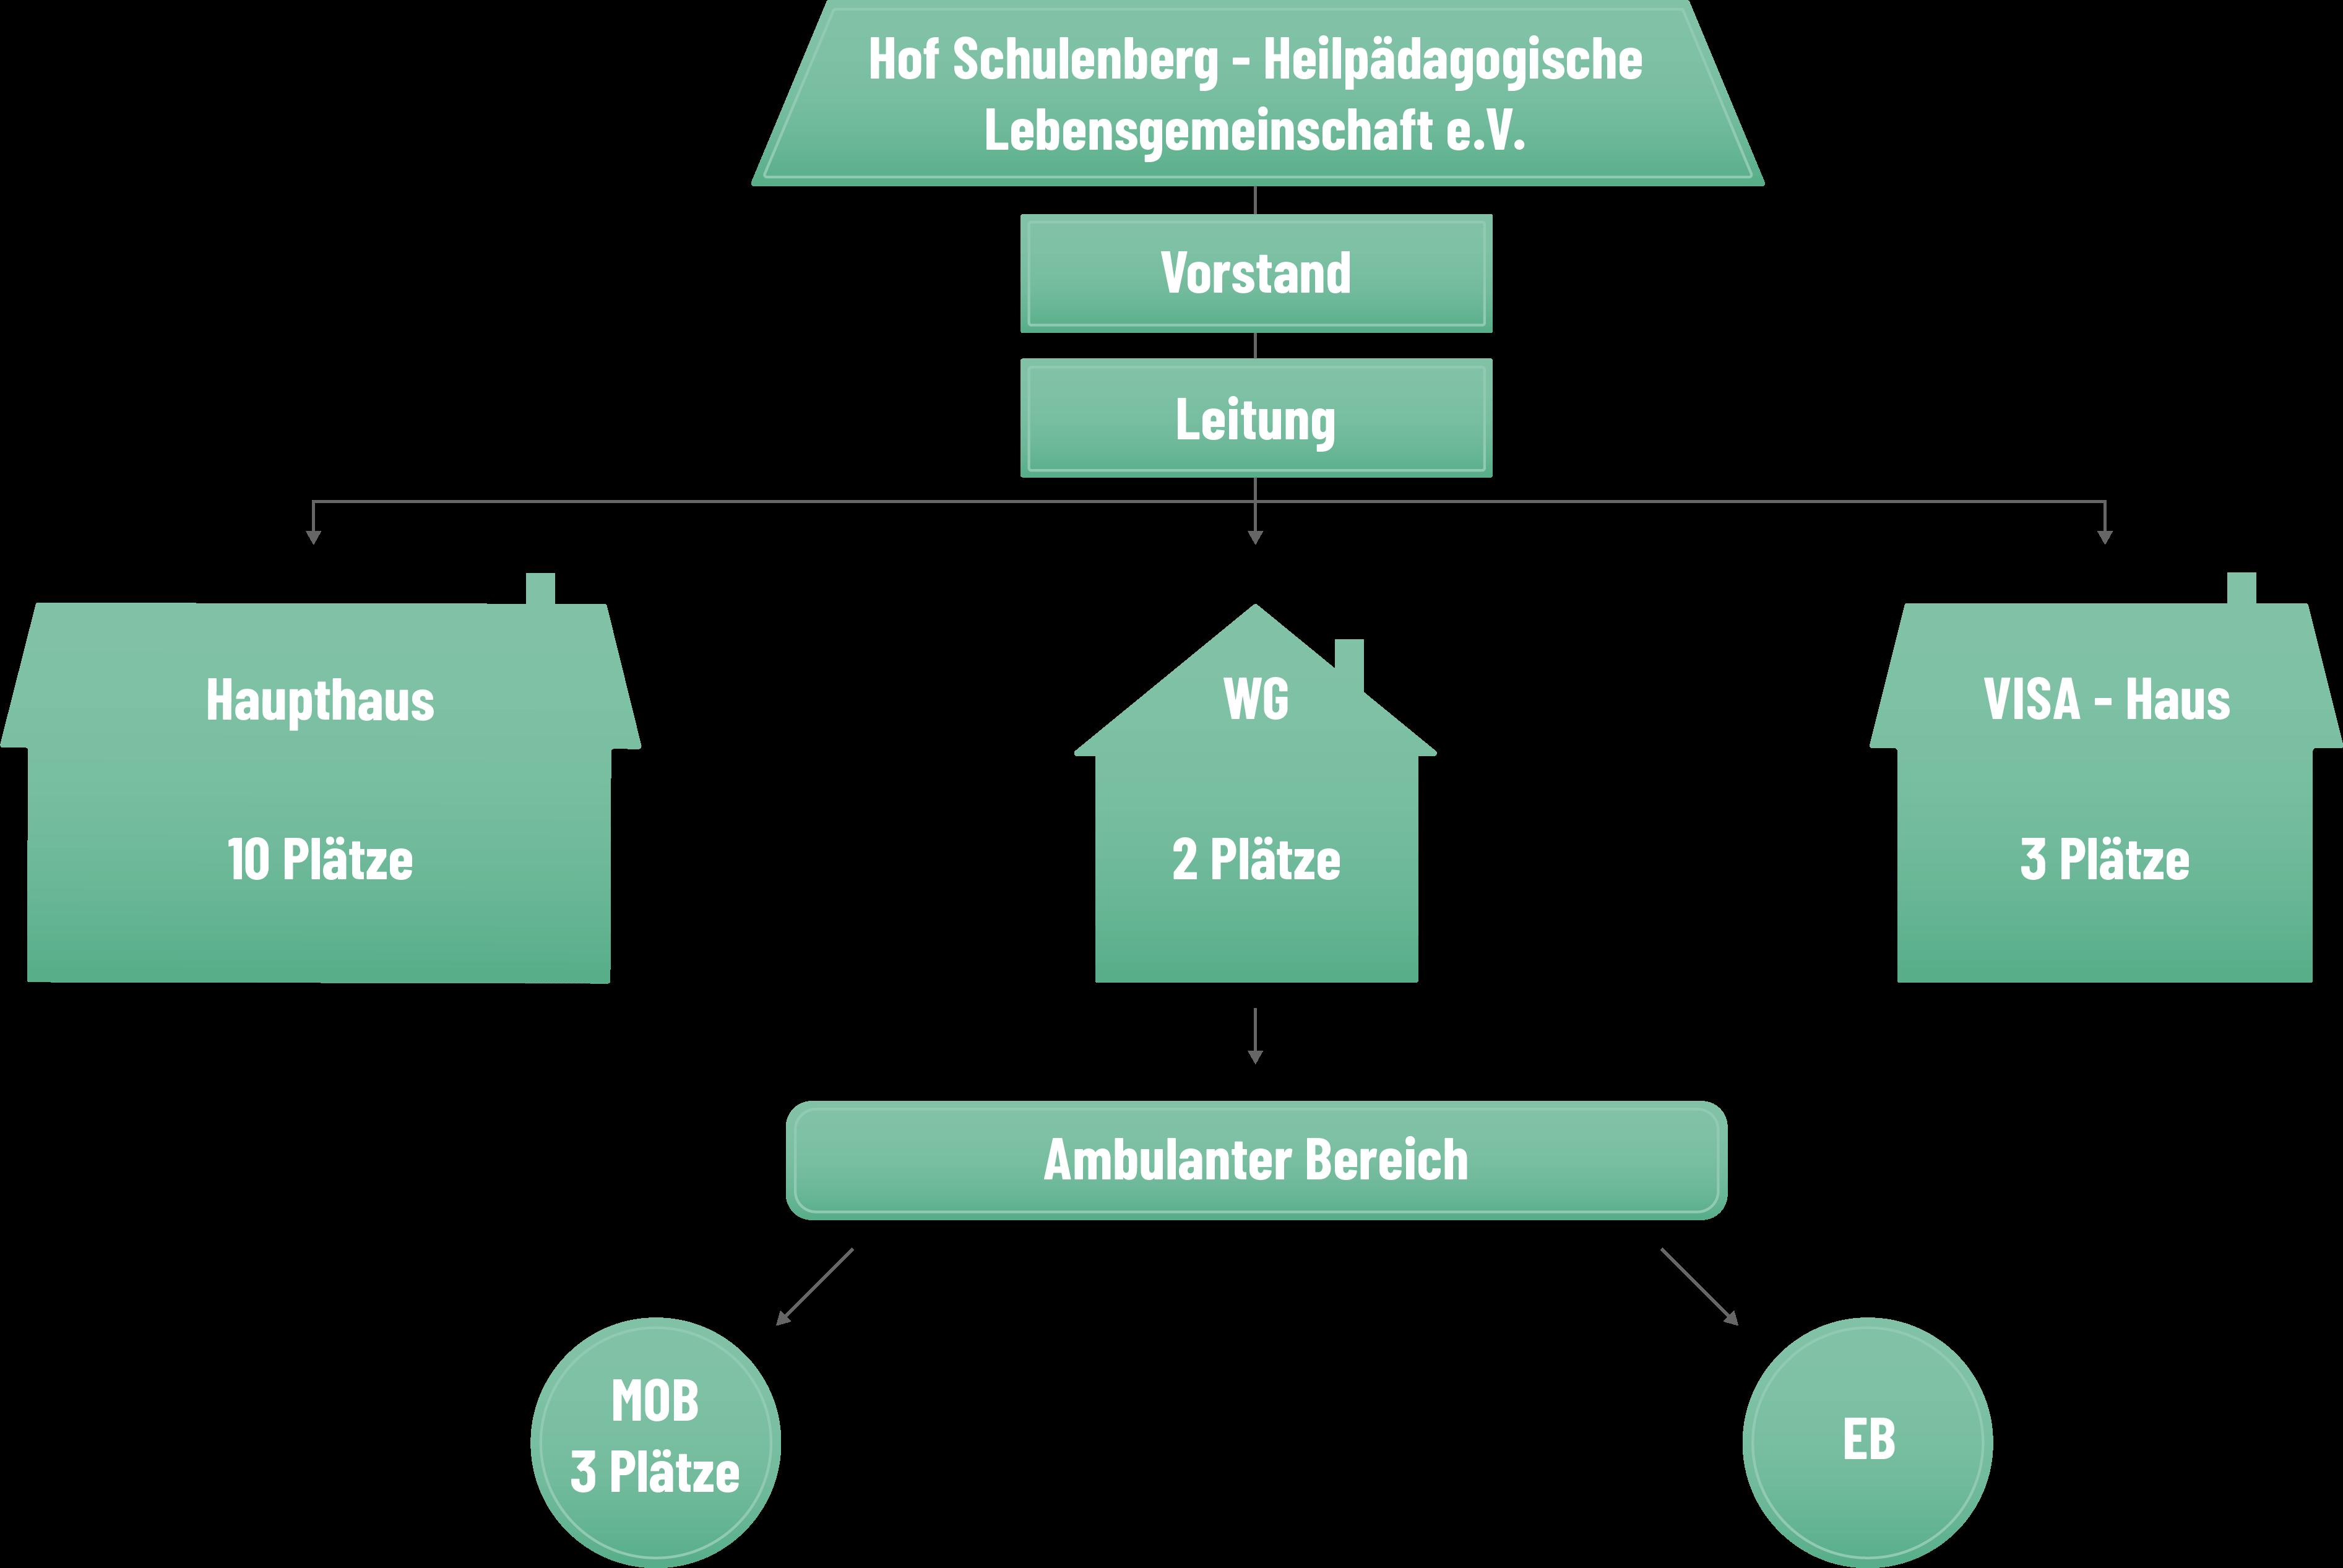 Hof Schulenberg Ornigramm